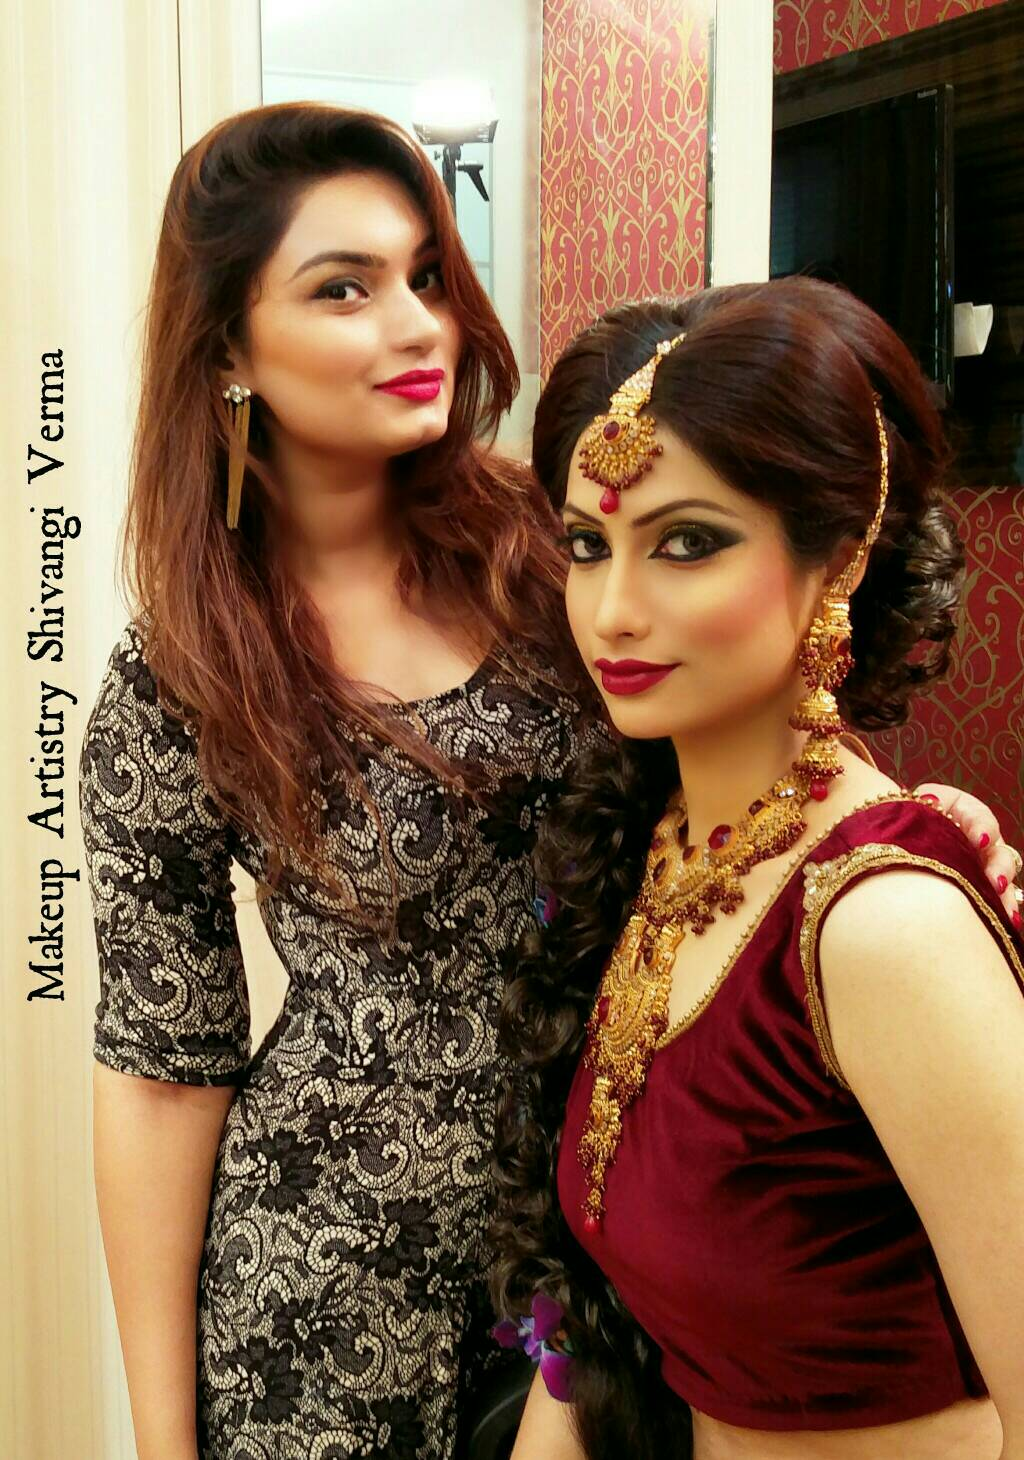 Makeup Artistry Shivangi Verma